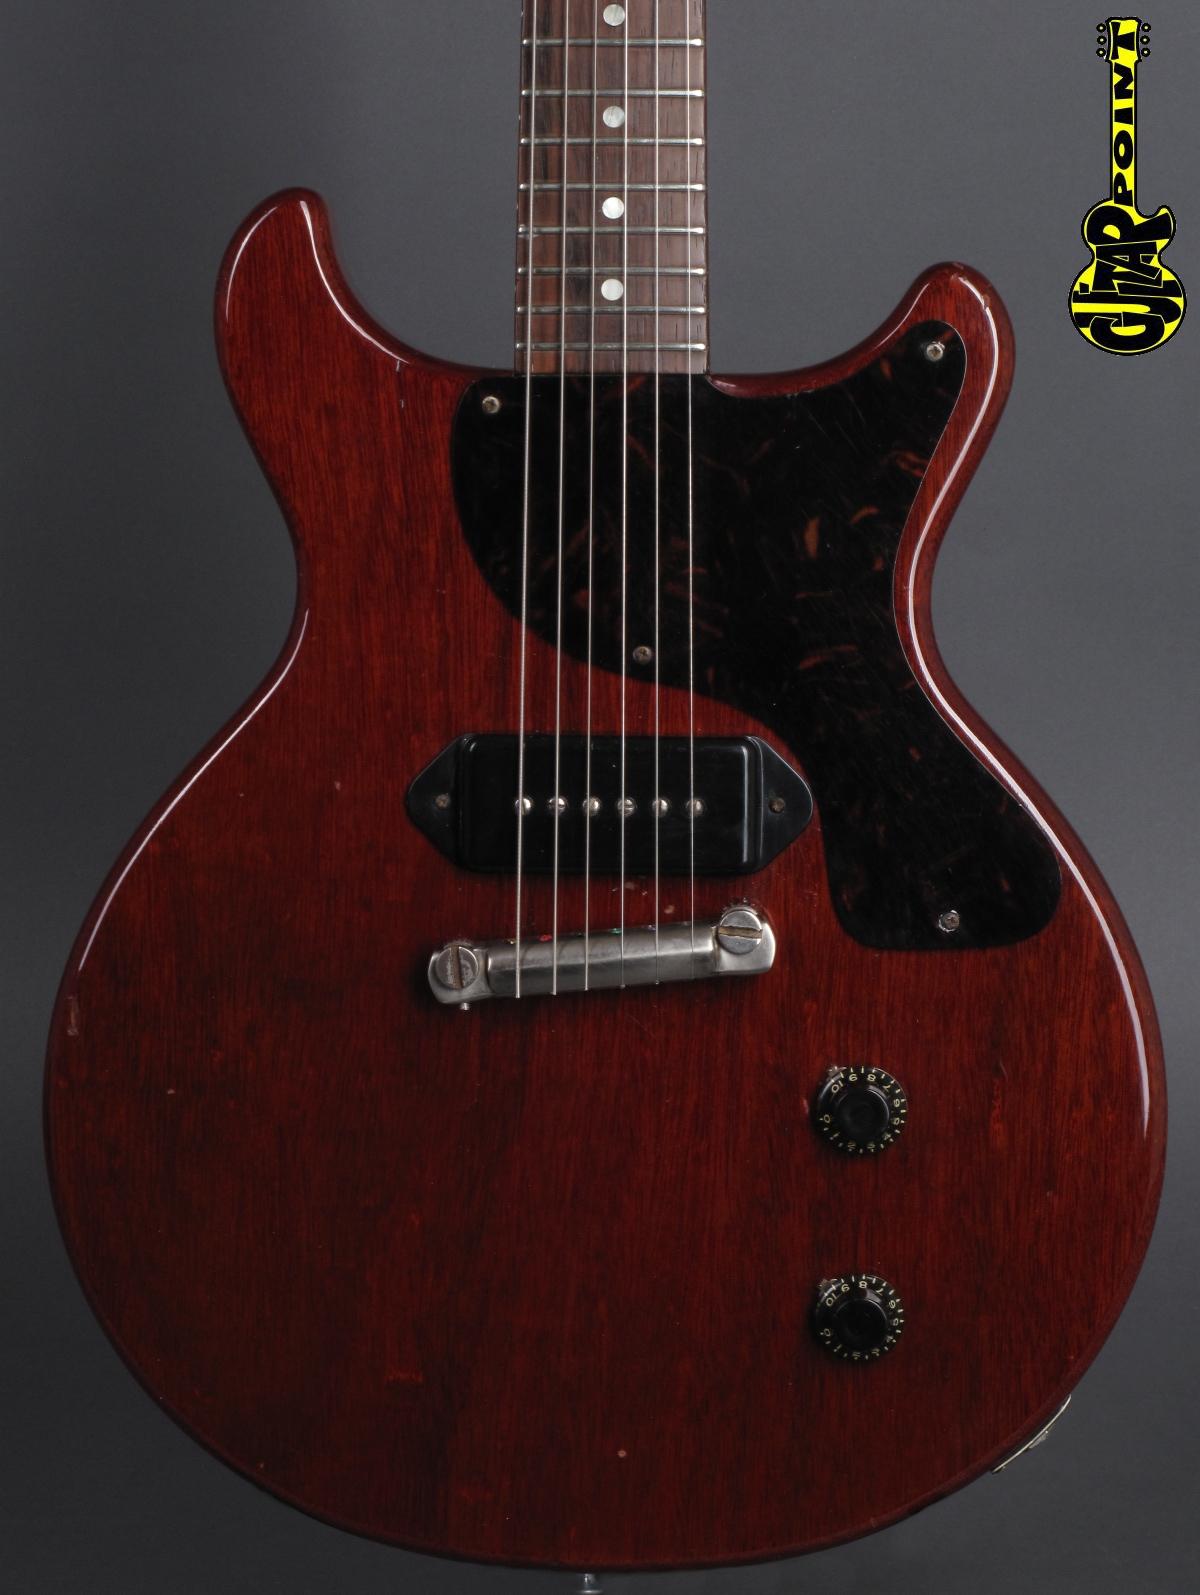 1959 Gibson Les Paul Junior DC - Cherry